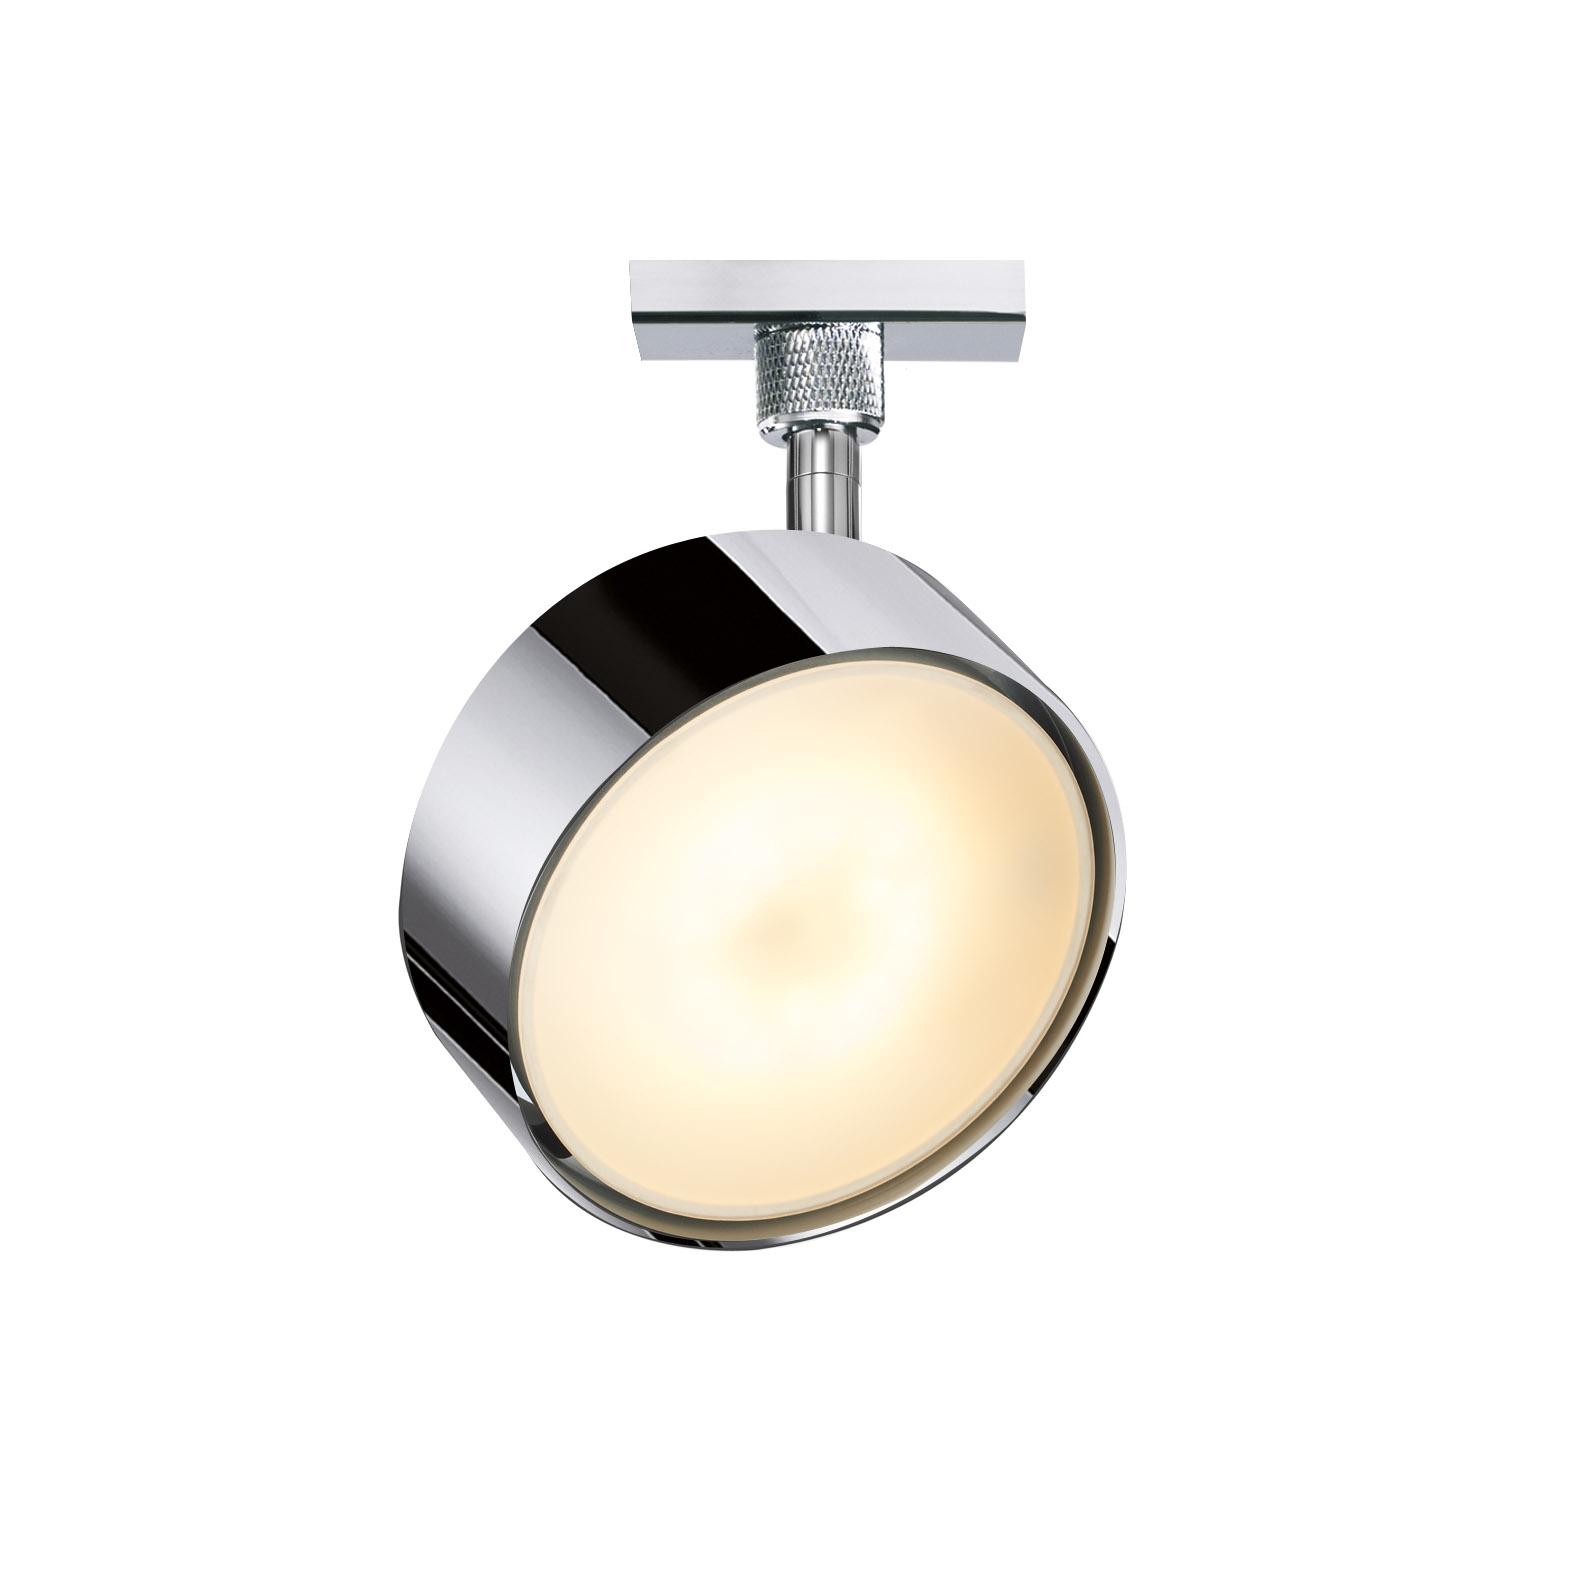 Bruck Duolare Tuto LED Spot, chrom.